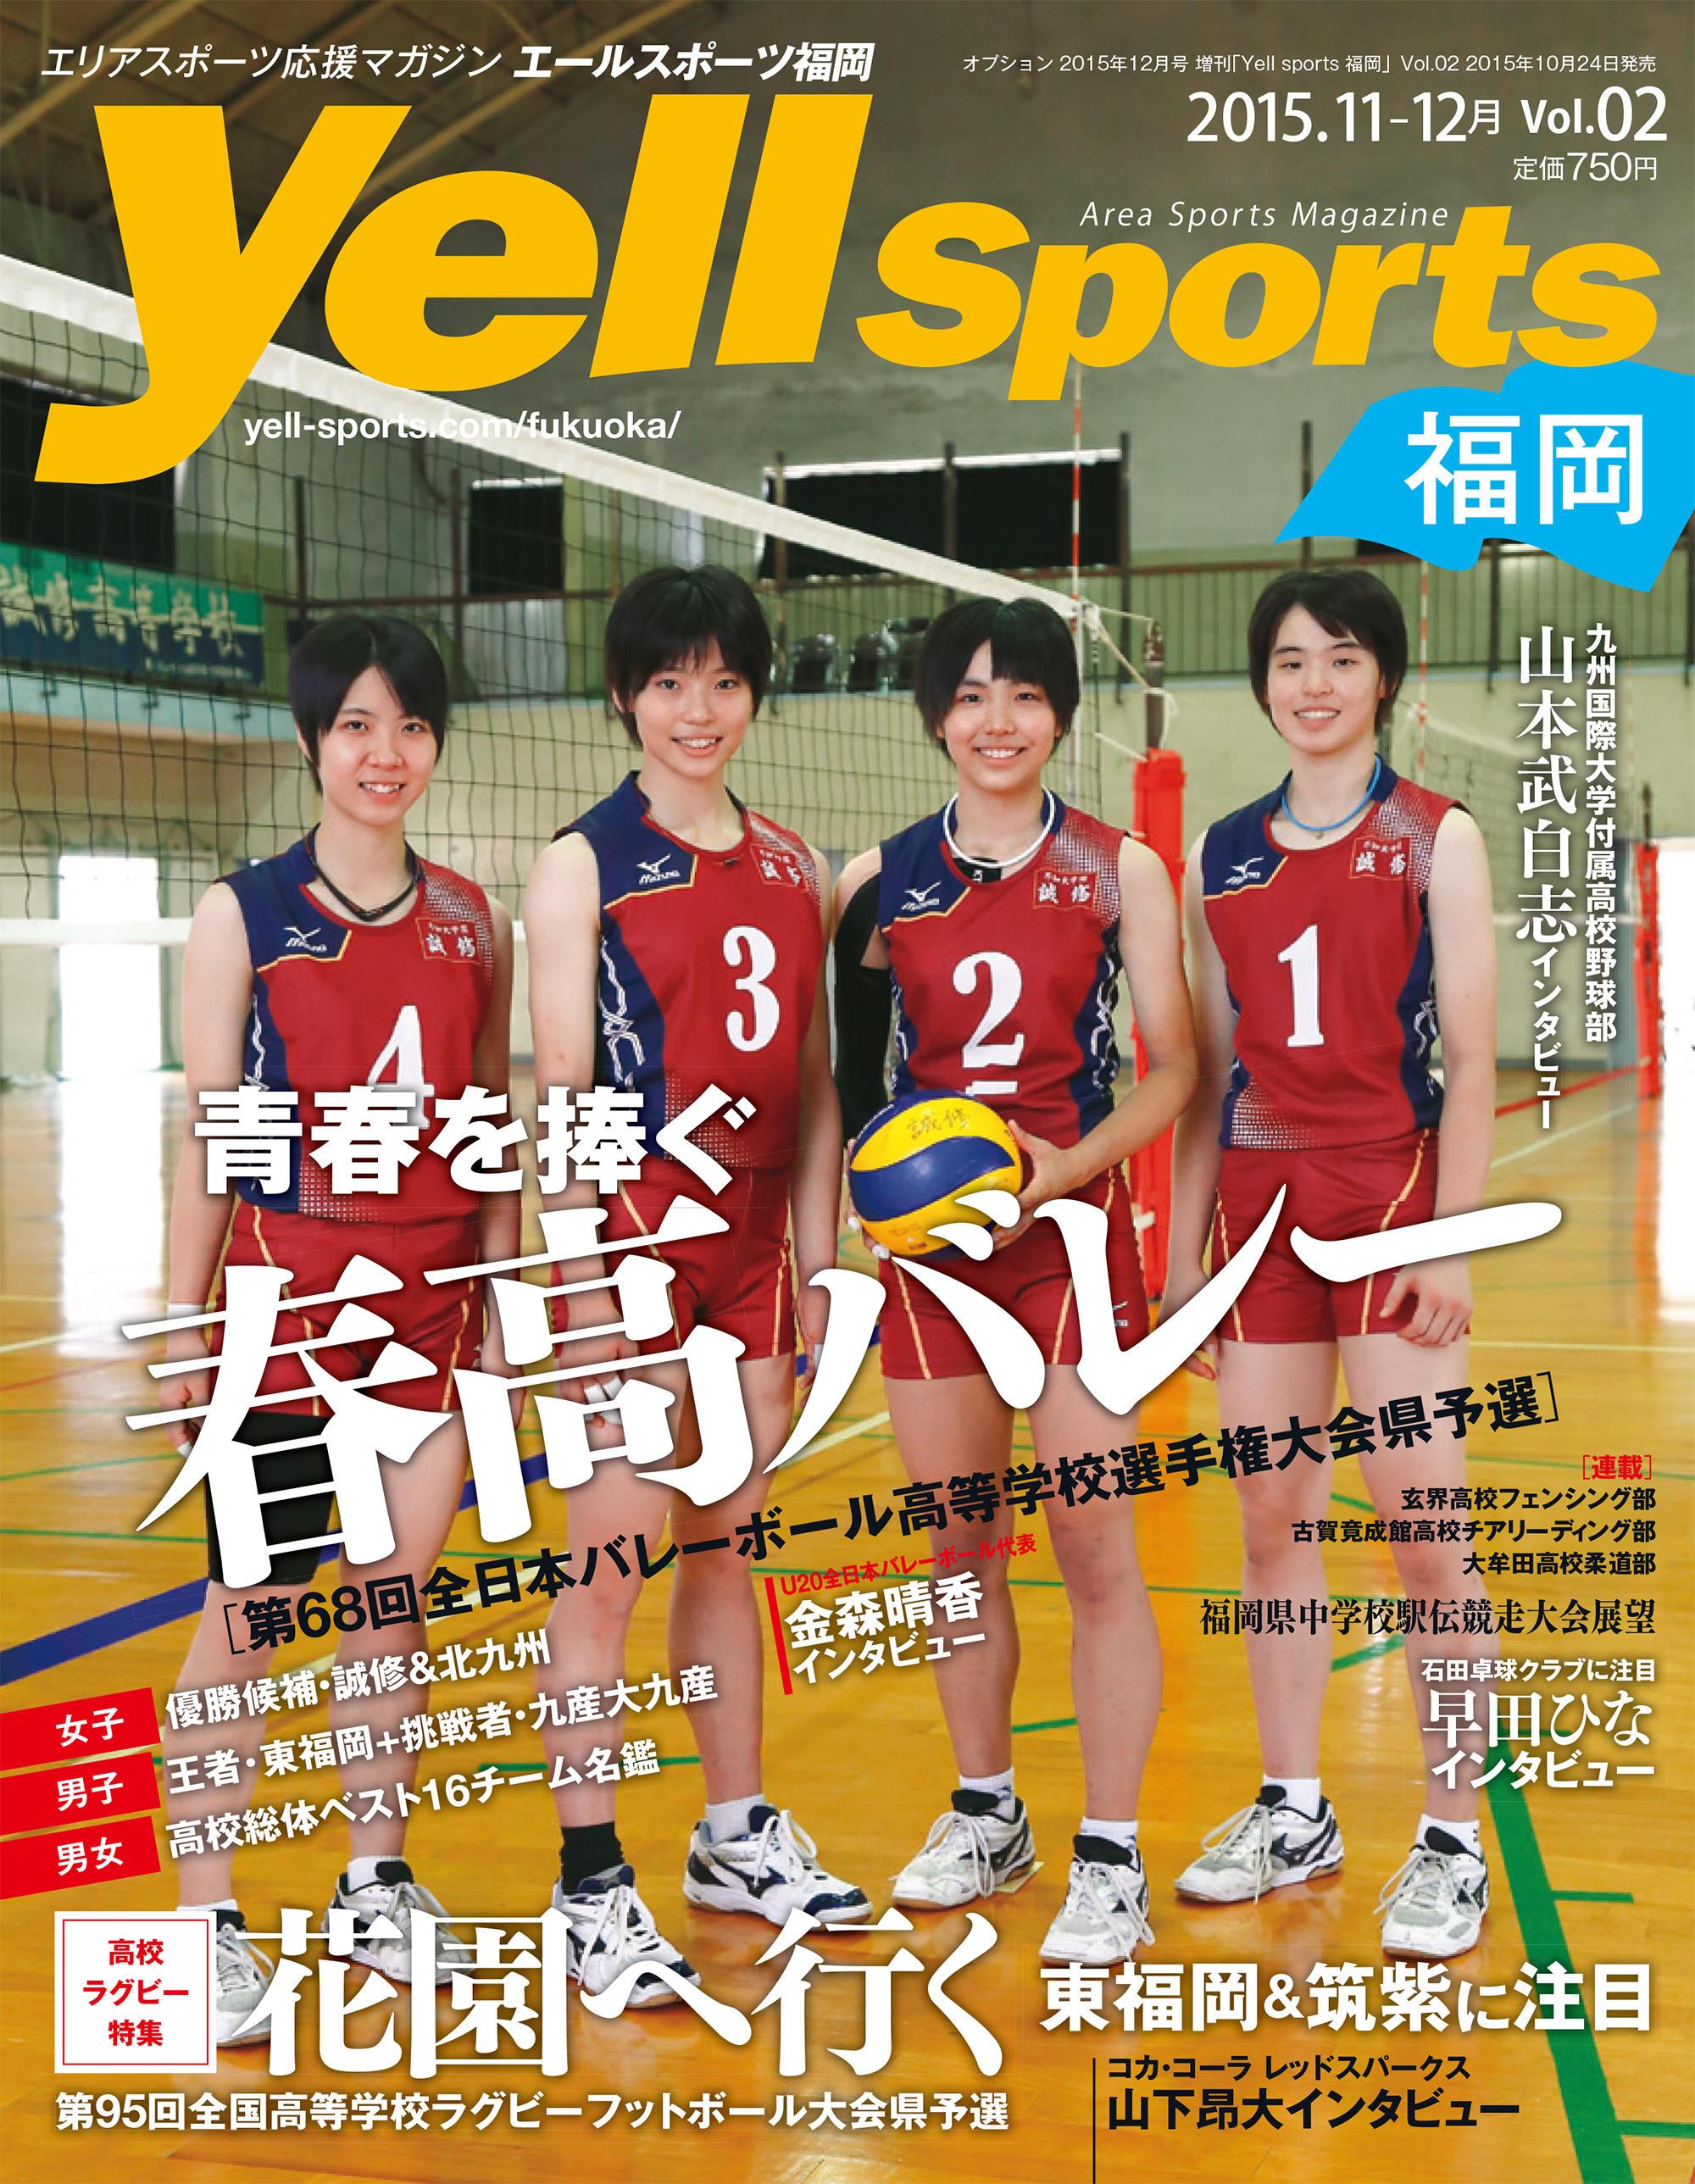 http://scrummachines.sakura.ne.jp/yell/fukuoka/article/2015/fukuoka01_1.jpg